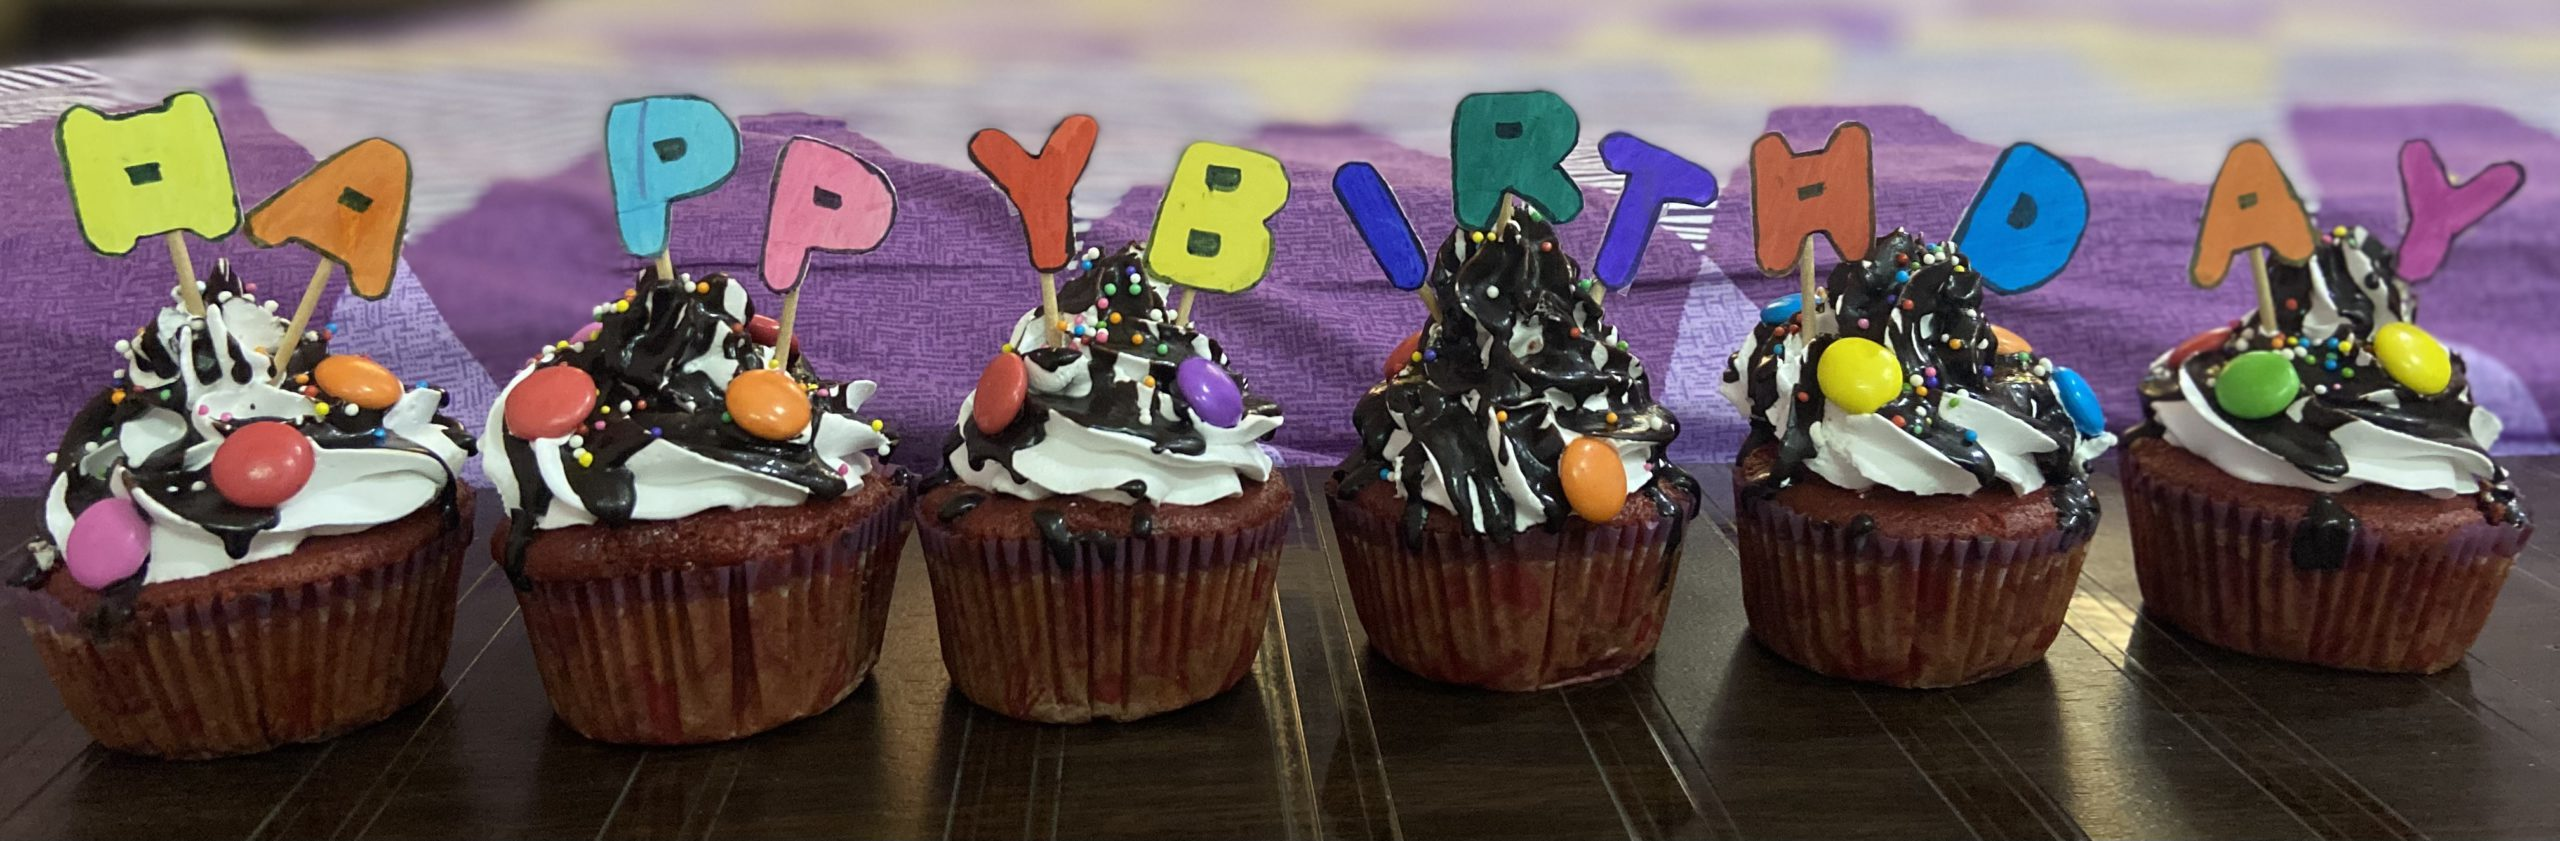 Cupcakes (6nos.) Designs, Images, Price Near Me